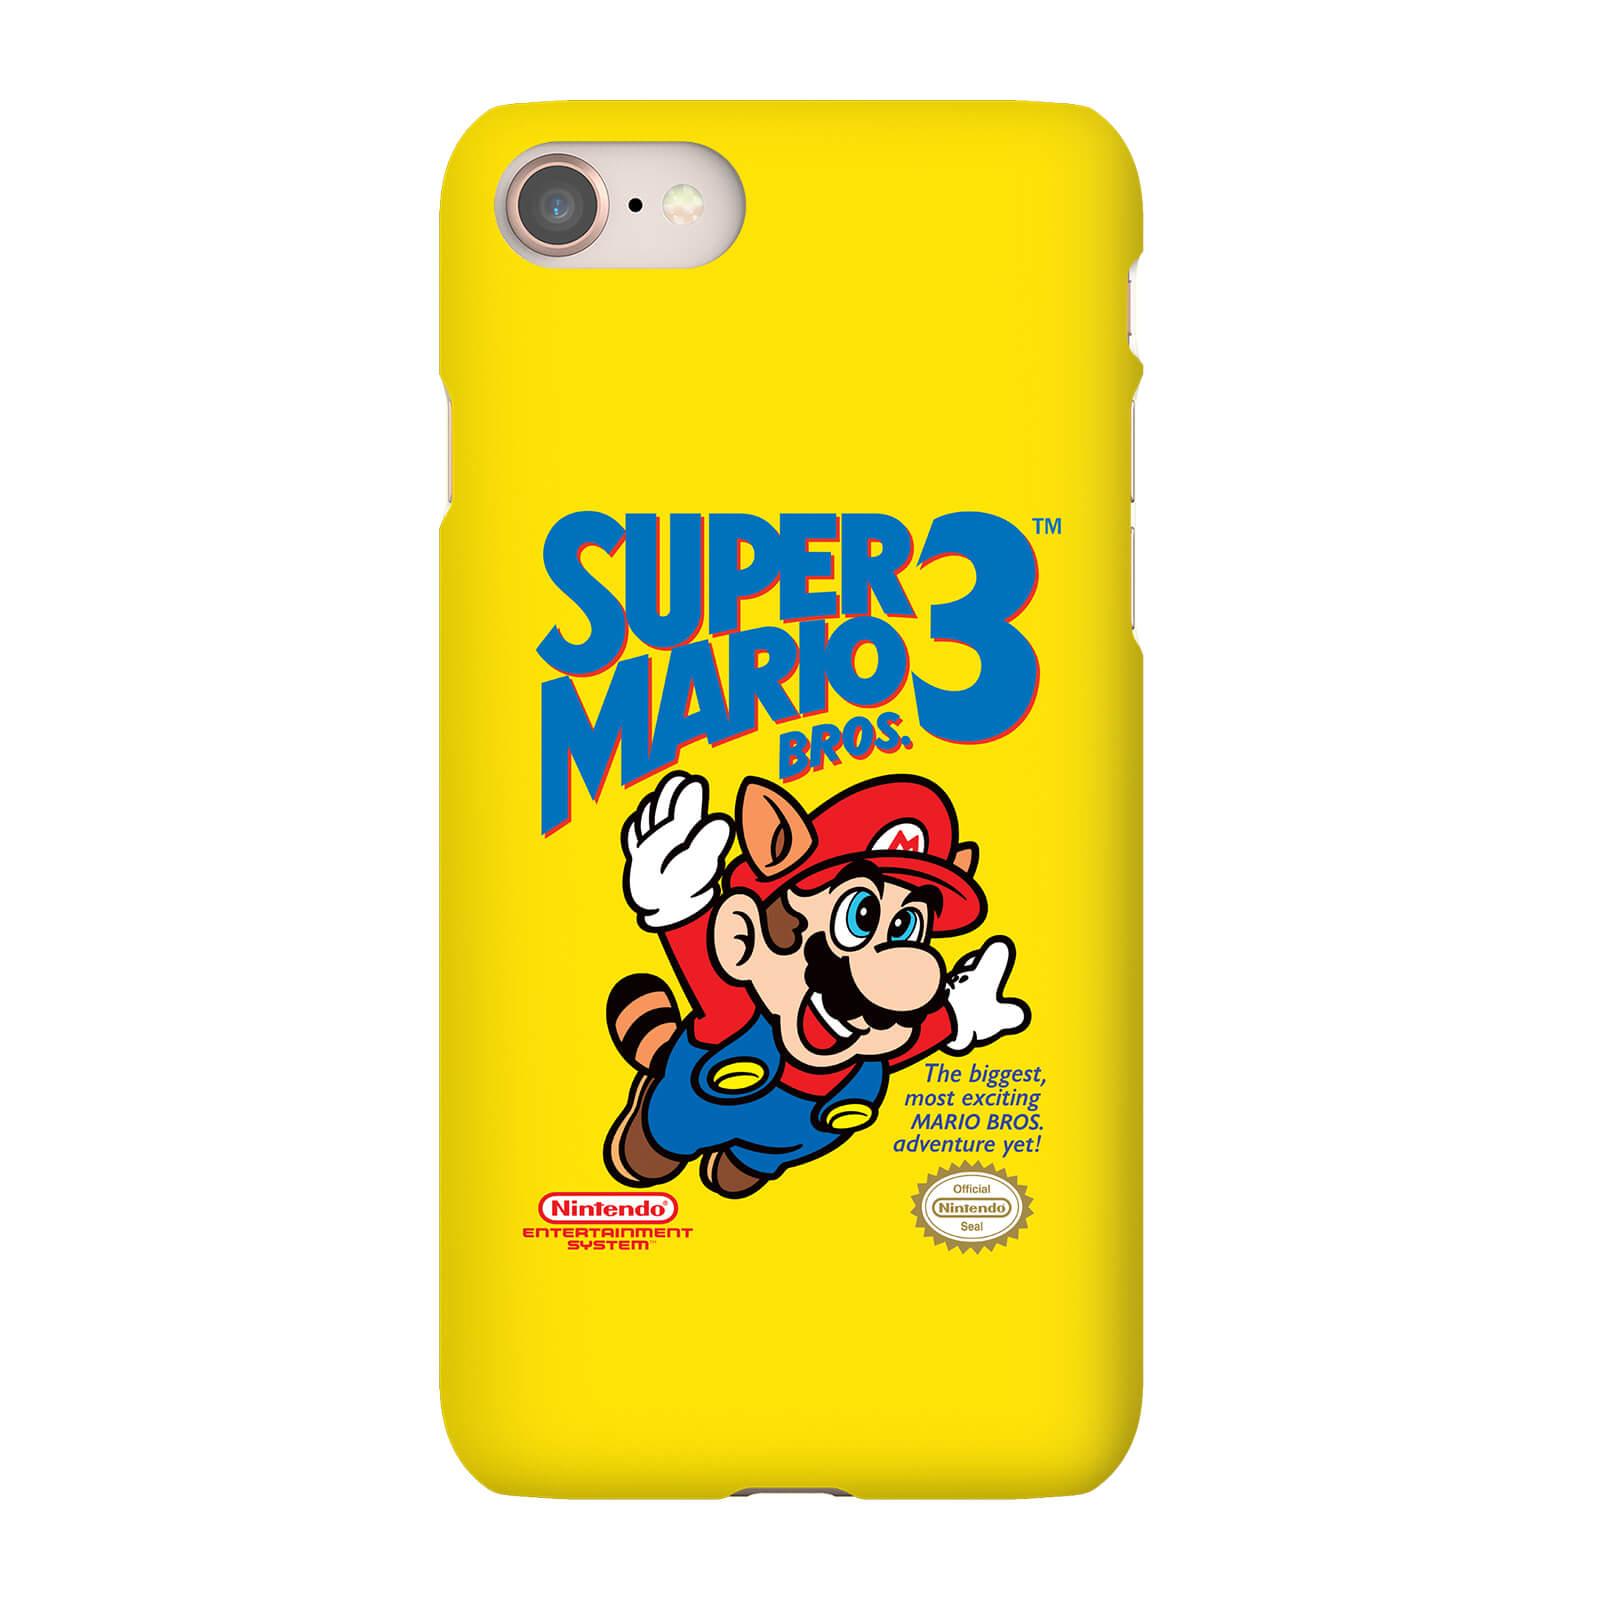 Nintendo Super Mario Bros 3 Smartphone Hülle - iPhone 5C - Tough Hülle Matt